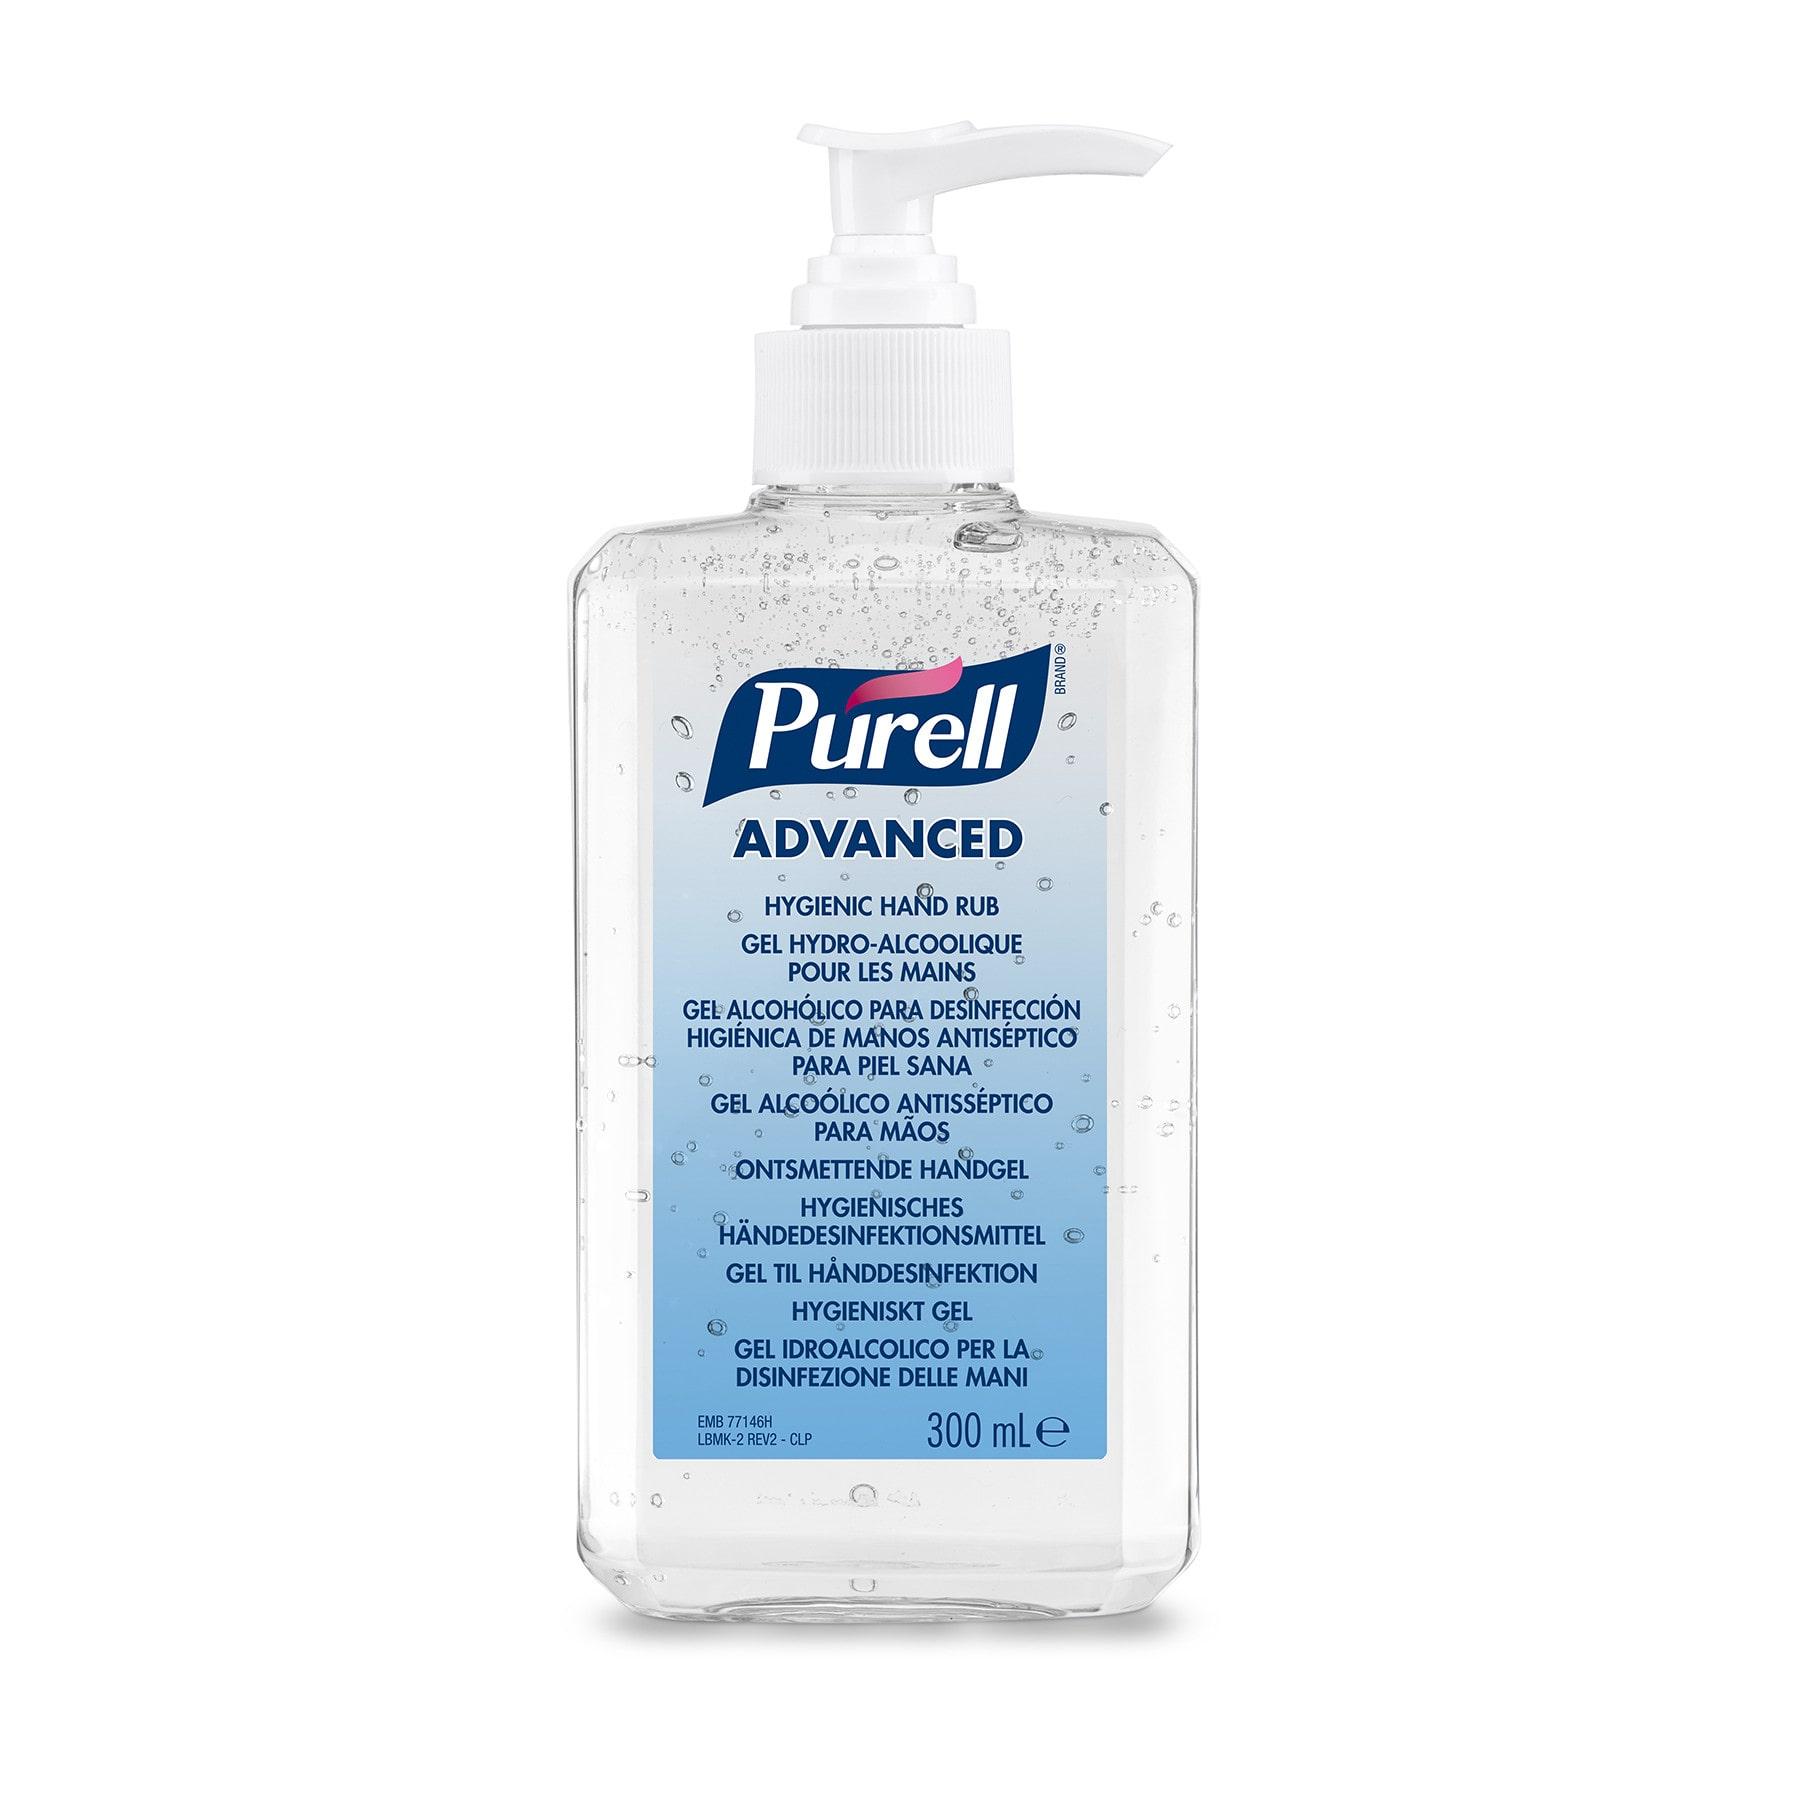 Gojo Purell Advanced desinfecterende handgel 12 x 300 ml